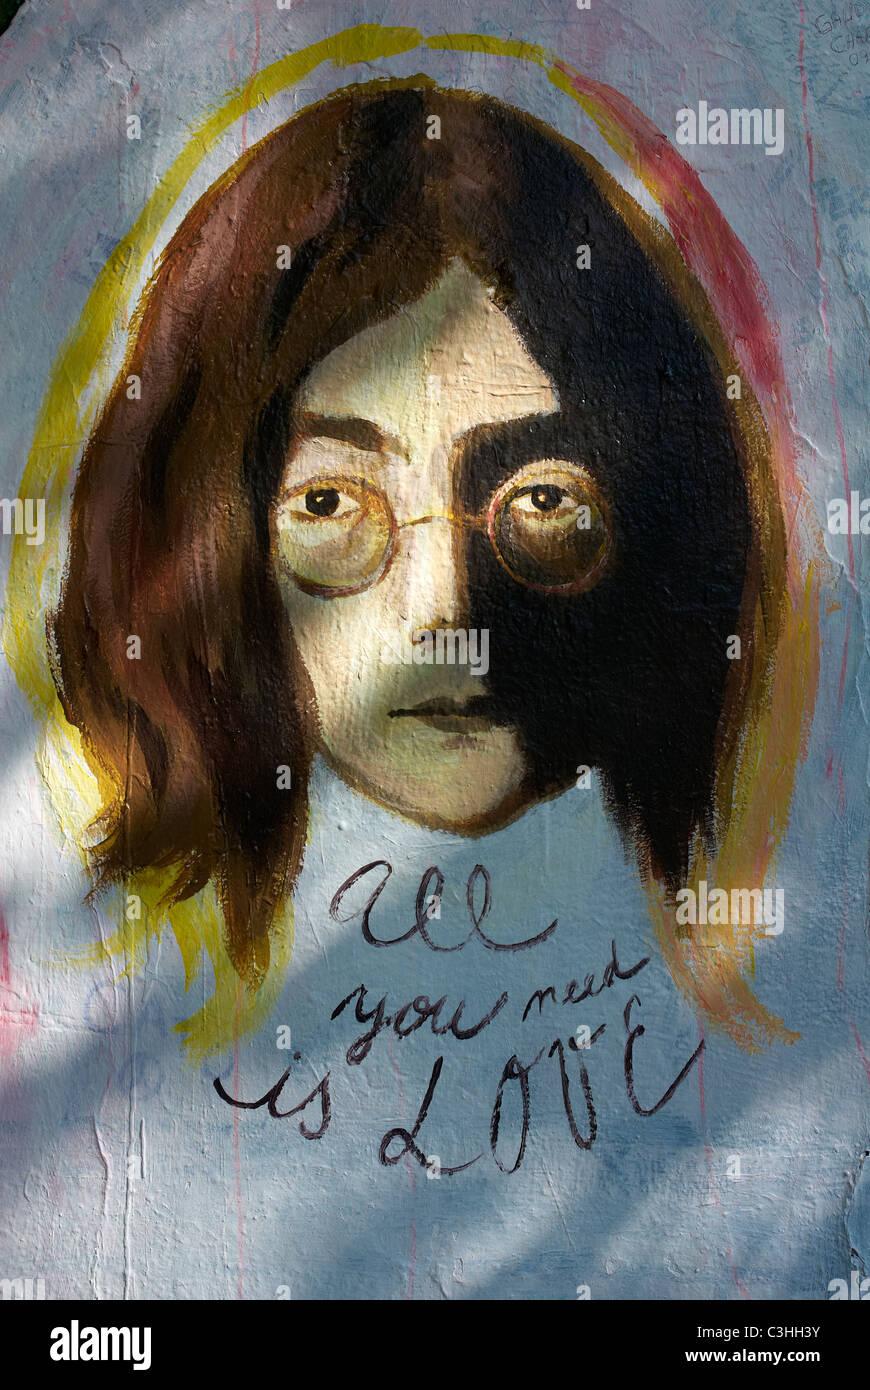 The John Lennon Wall in Prague, Czech Republic - Stock Image